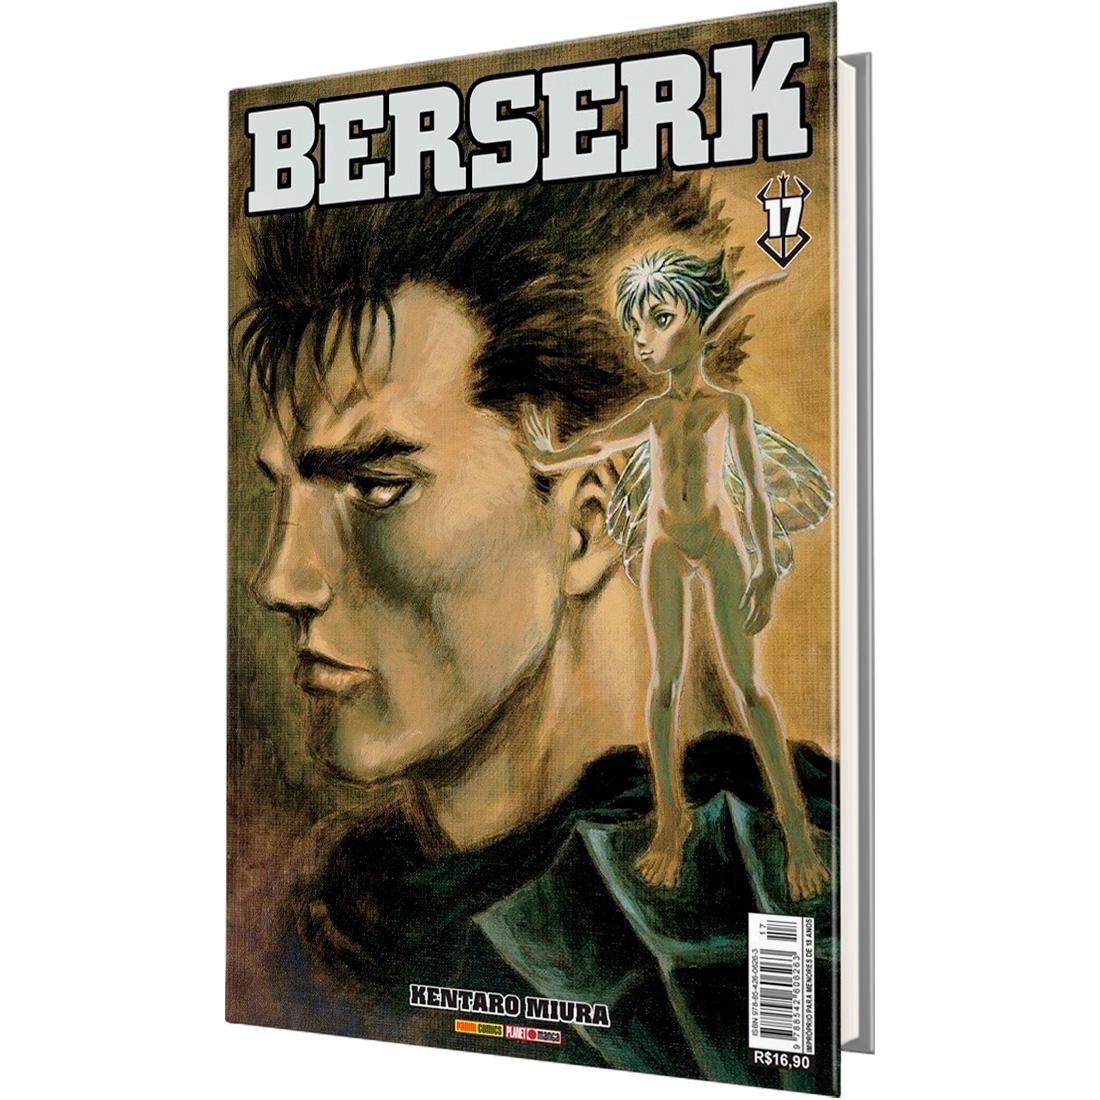 Berserk - Edição de Luxo Vol. 17